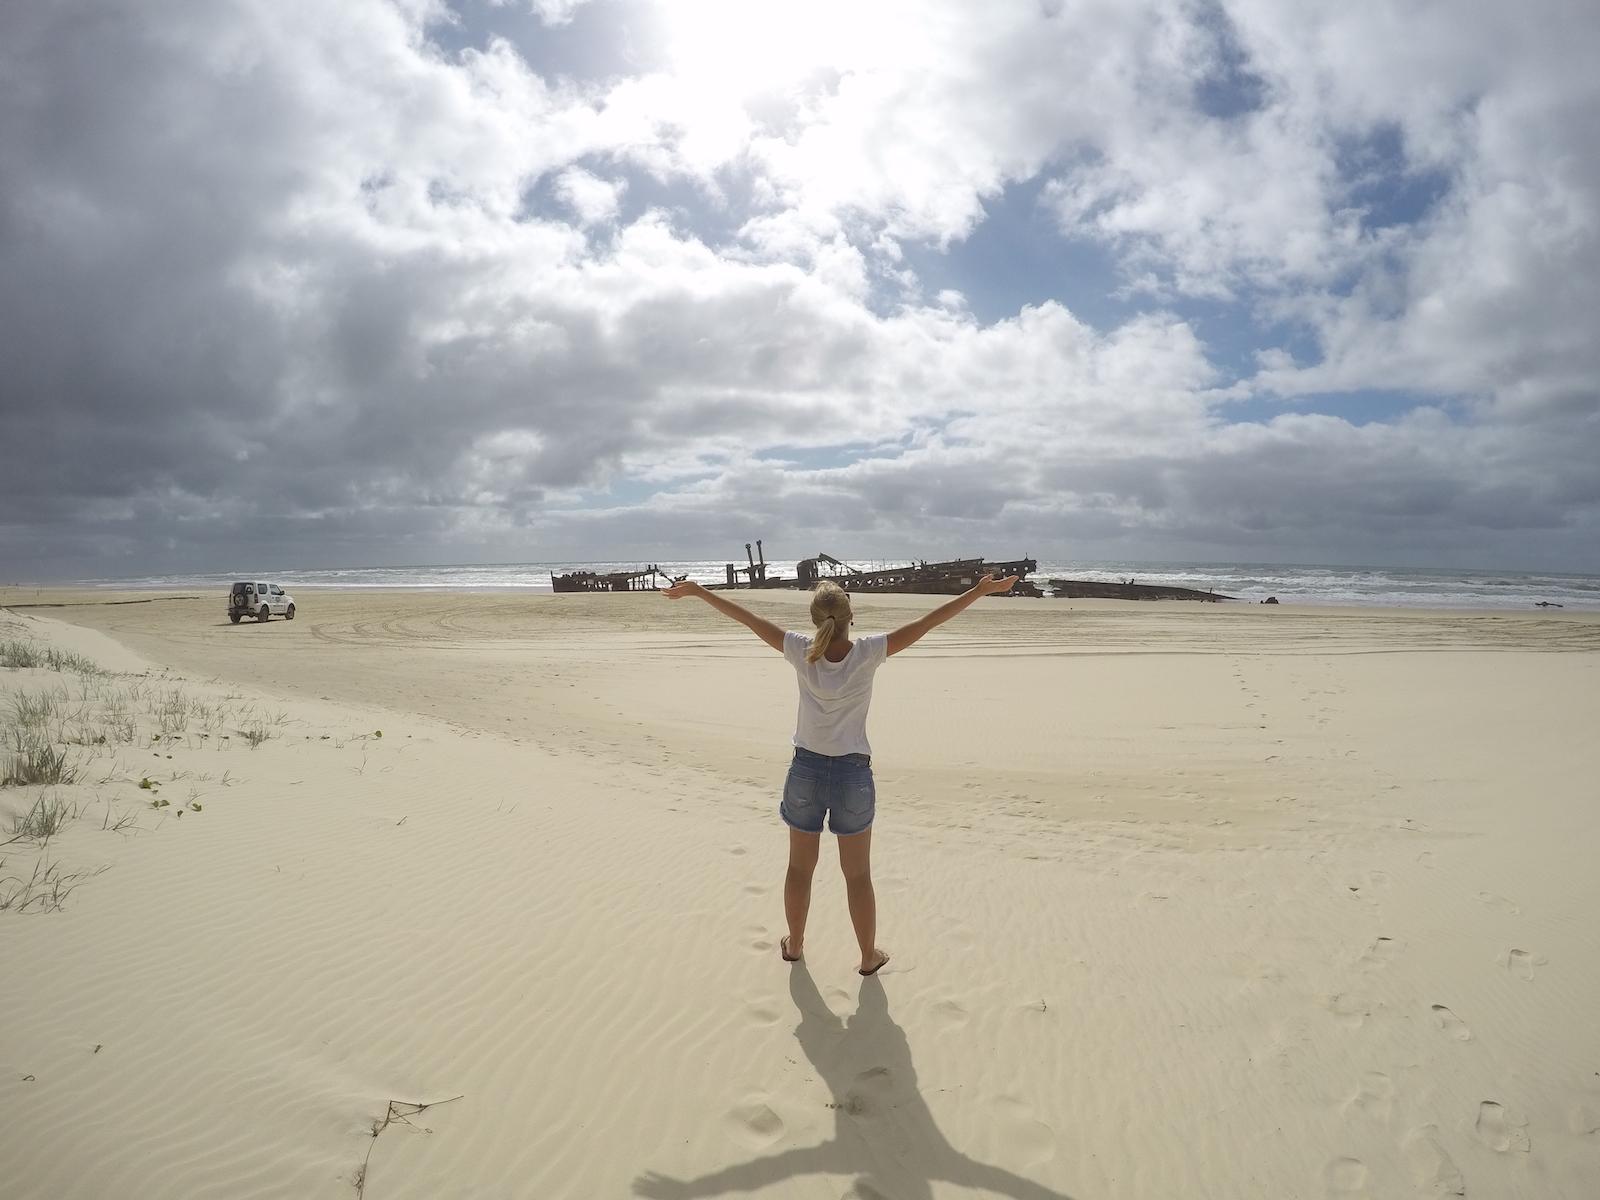 ourameo-reiseplanung-australien-individualreise-fraserisland